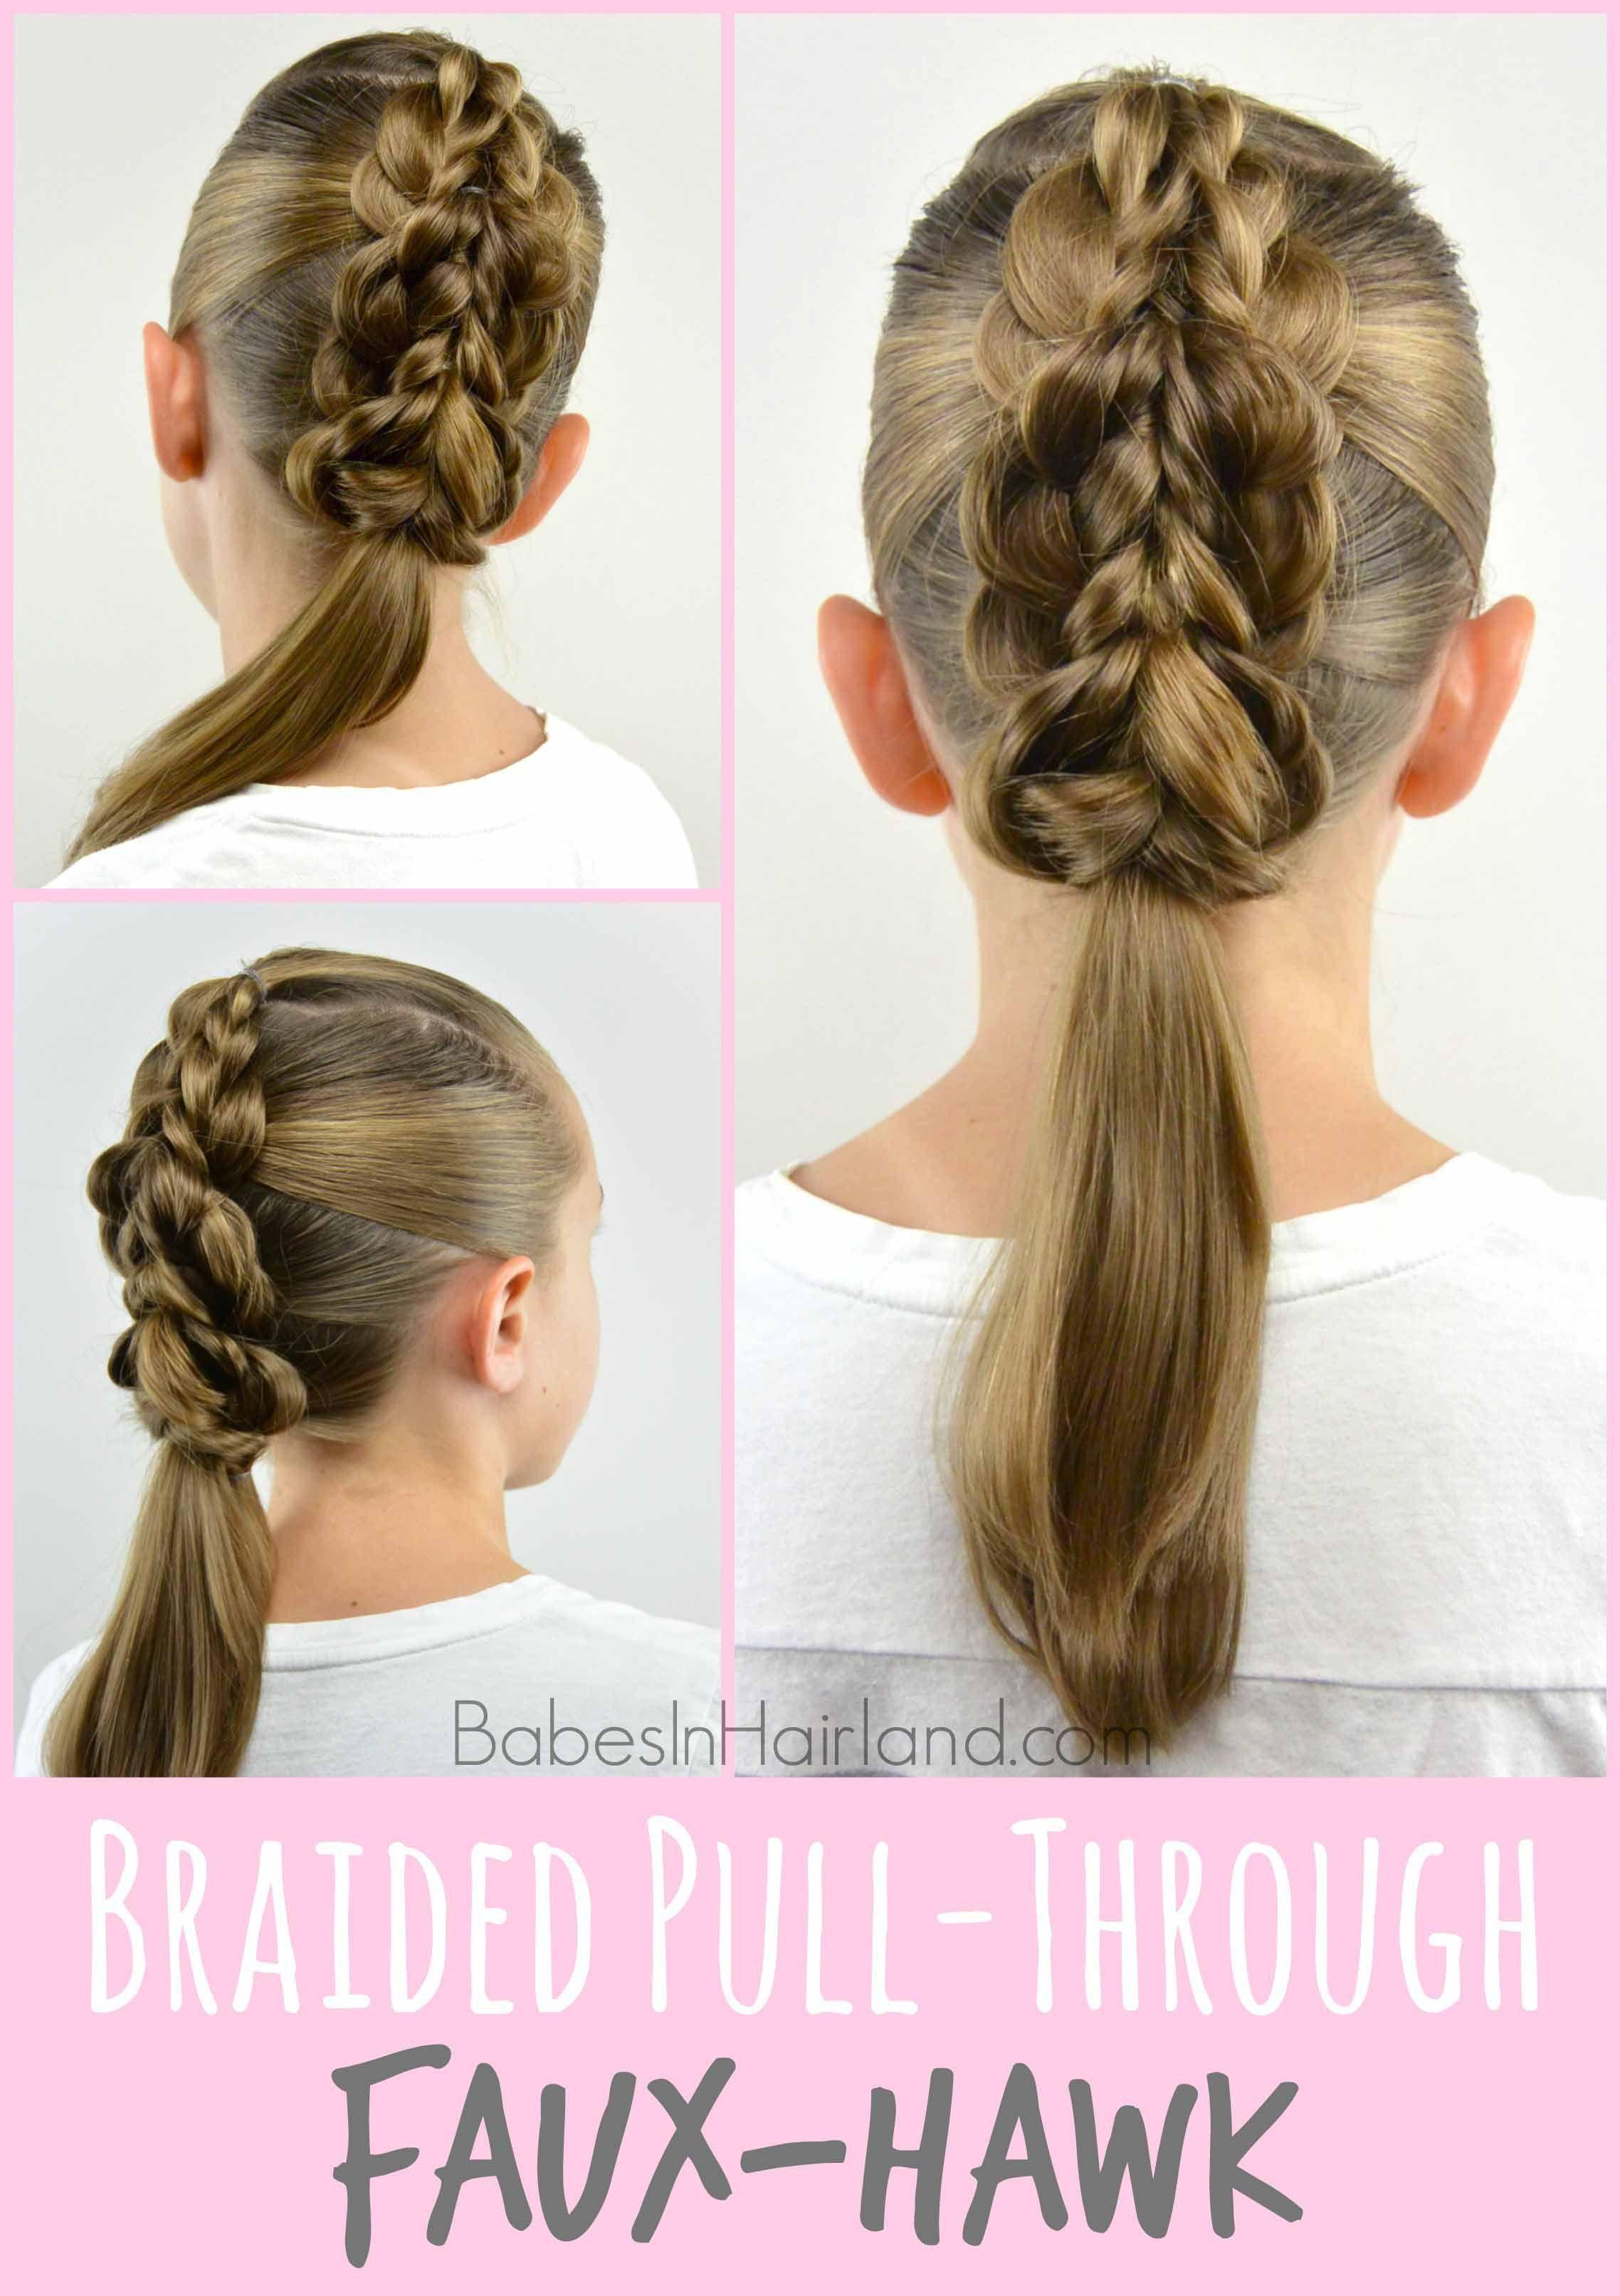 Braided pullthrough fauxhawk babes in hairland tutorials